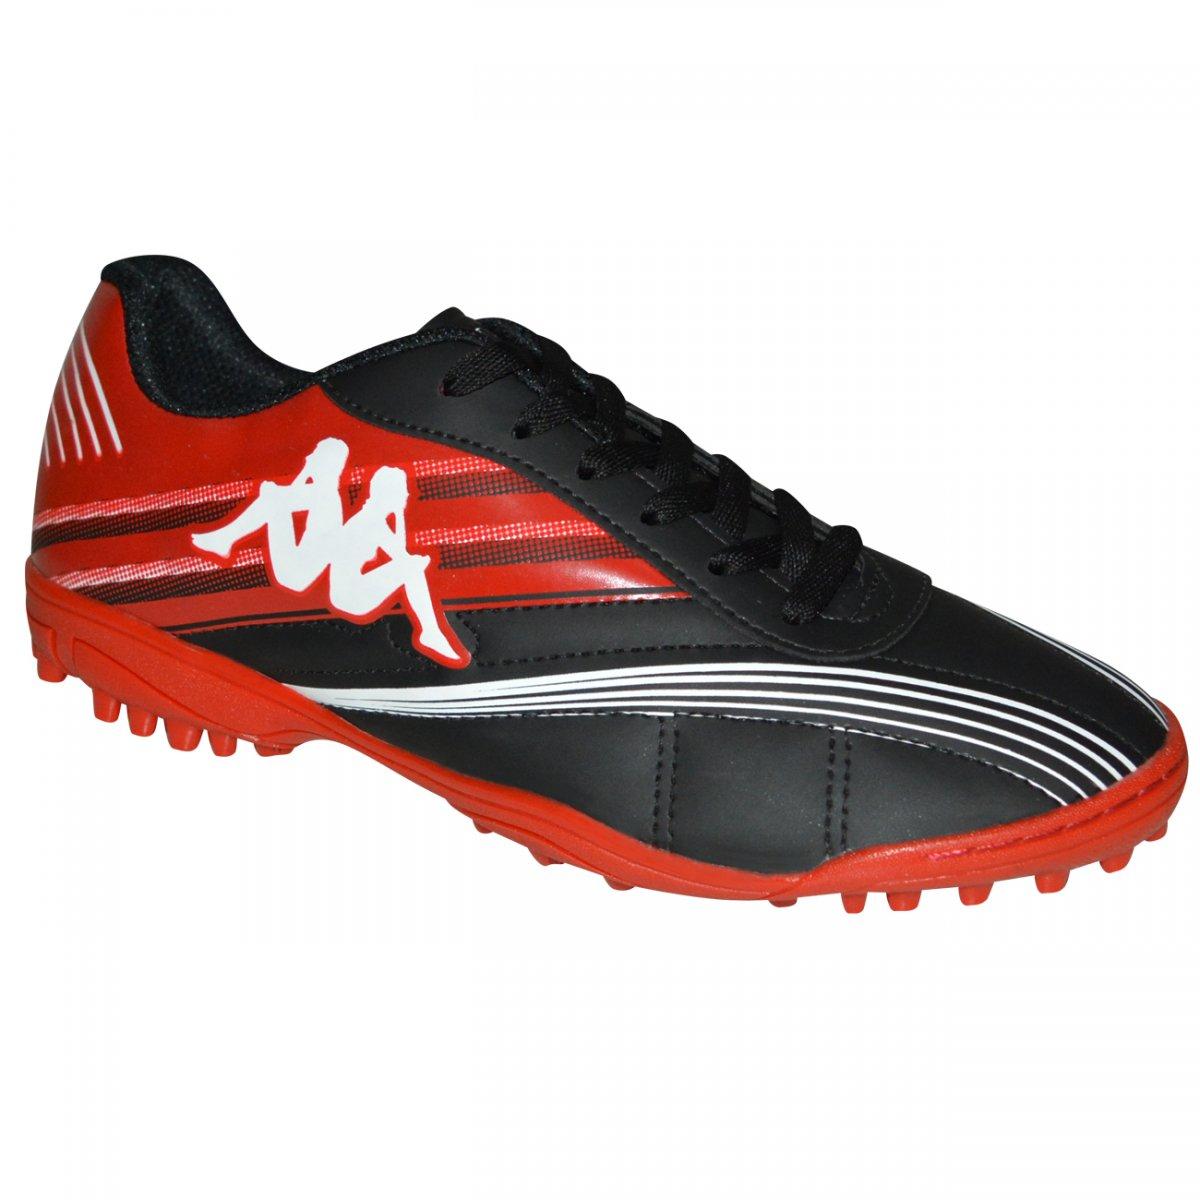 83b70e7a27bfc Chuteira Society Kappa Modena II 8302 10.14.45 - Preto/vermelho - Chuteira  Nike, Adidas. Sandalias Femininas. Sandy Calçados